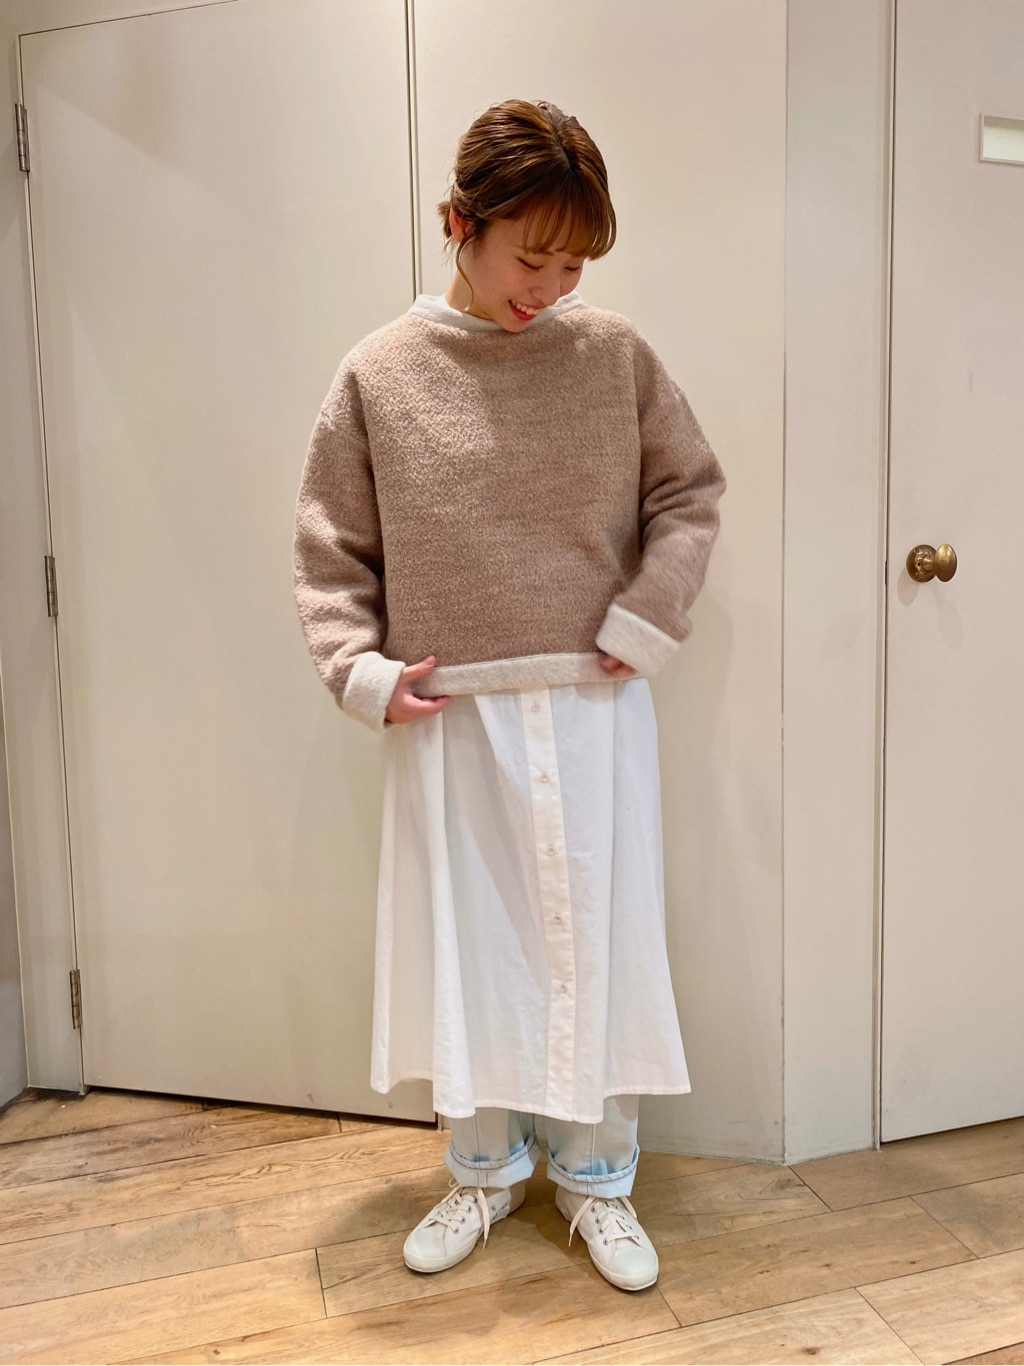 bulle de savon 新宿ミロード 身長:157cm 2020.11.16